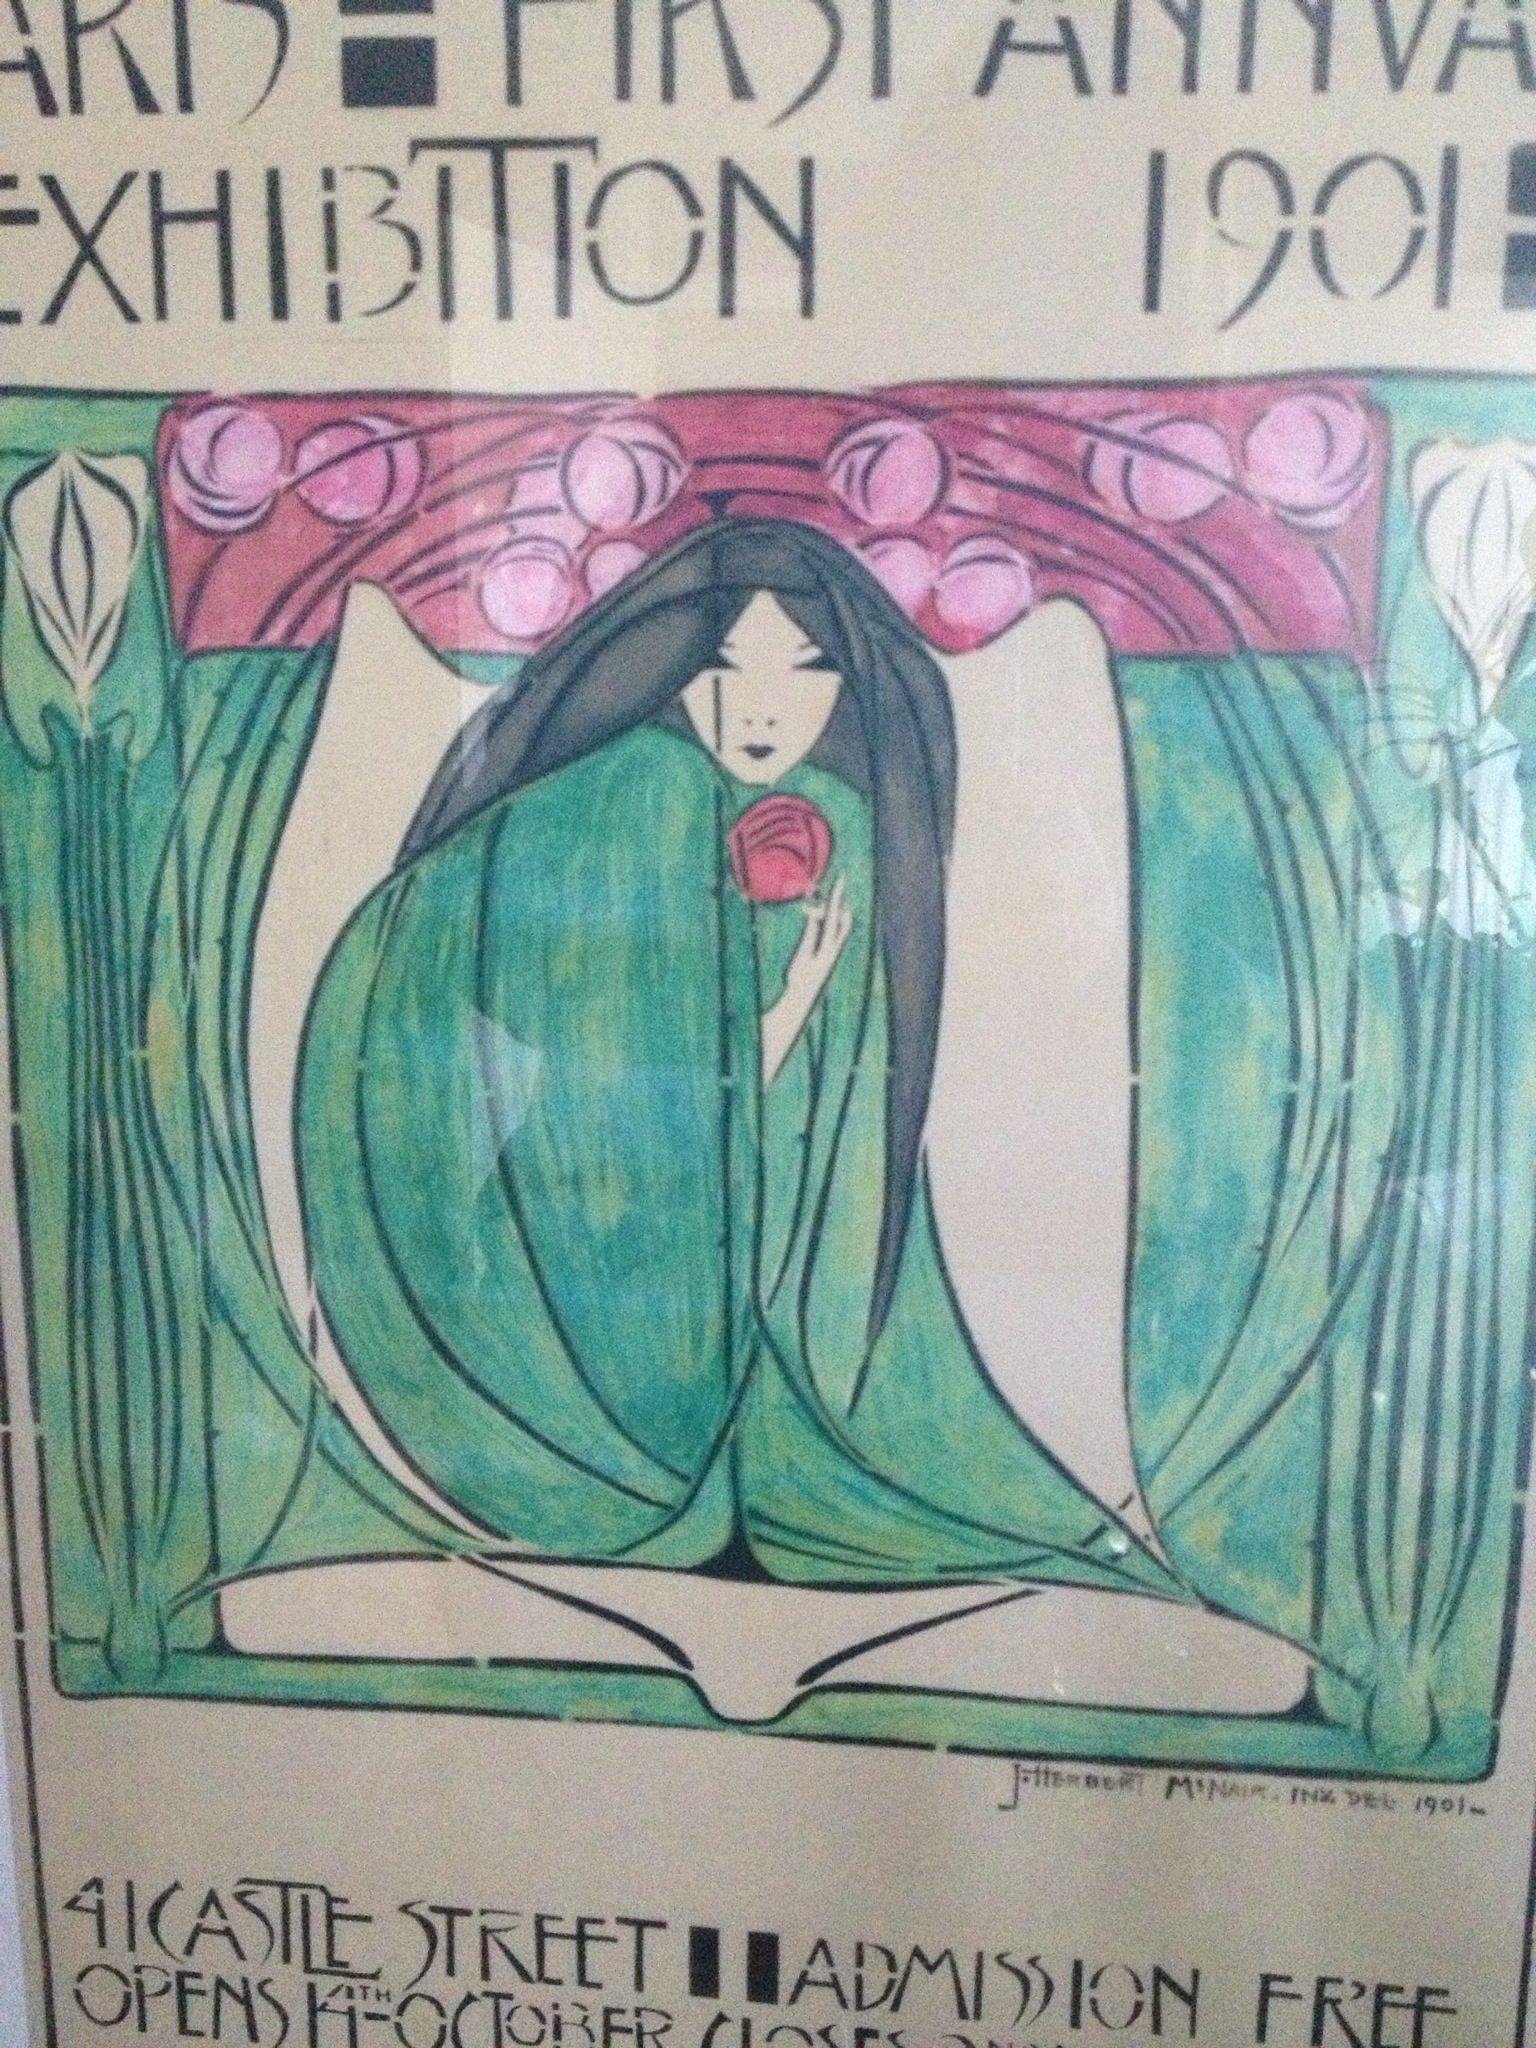 Margaret mackintosh Liverpool exhibition poster Art